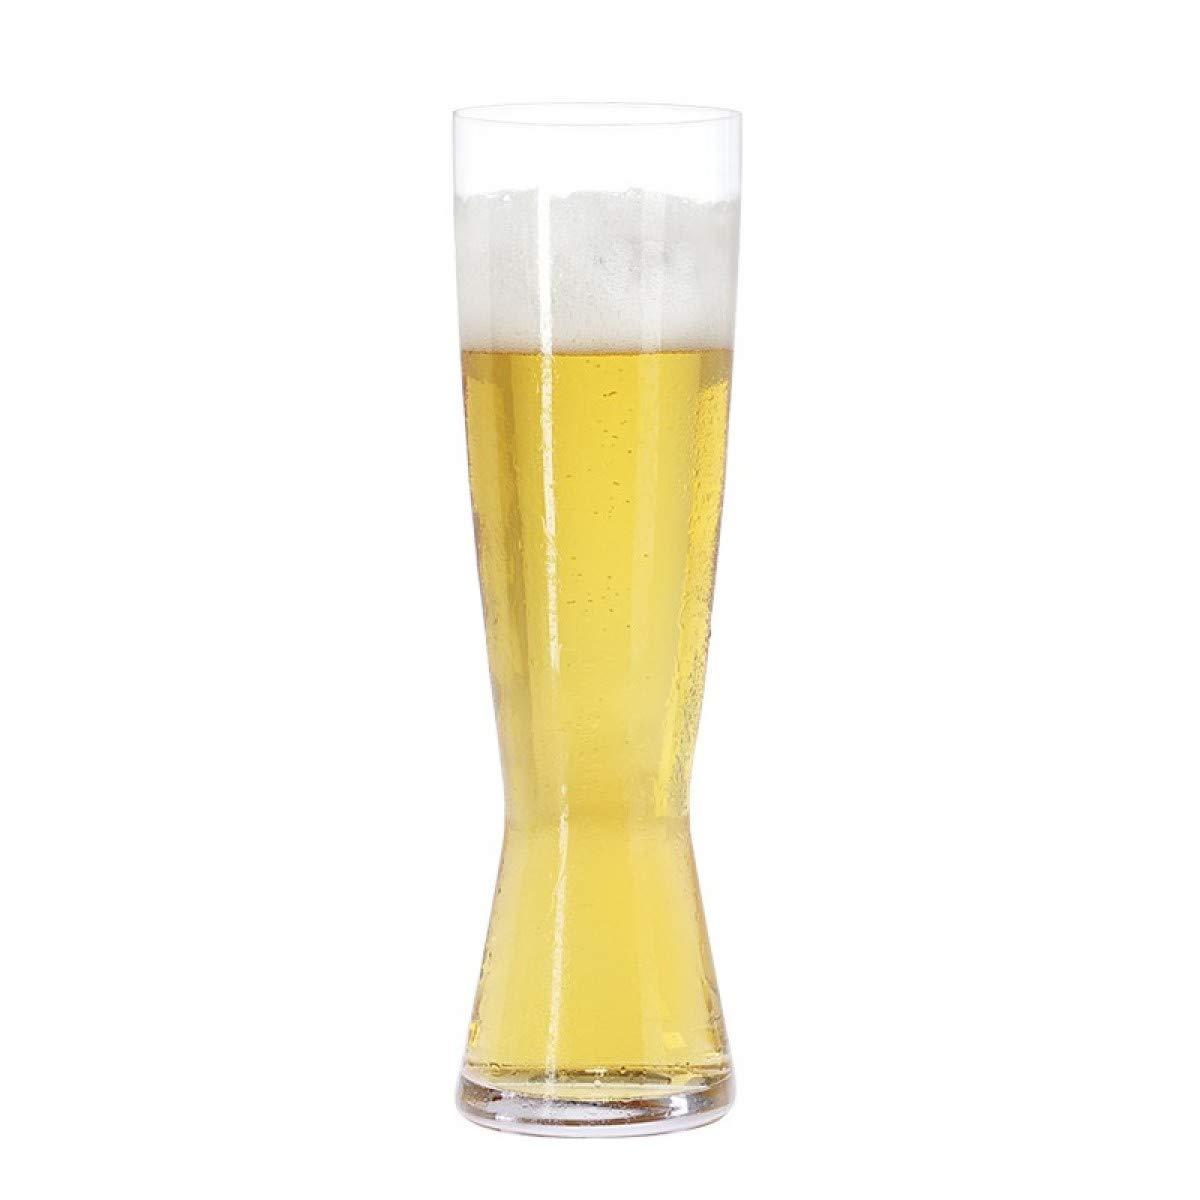 Spiegelau 4991970 Classics Pilsner Beer Glasses (Set of 4), Clear